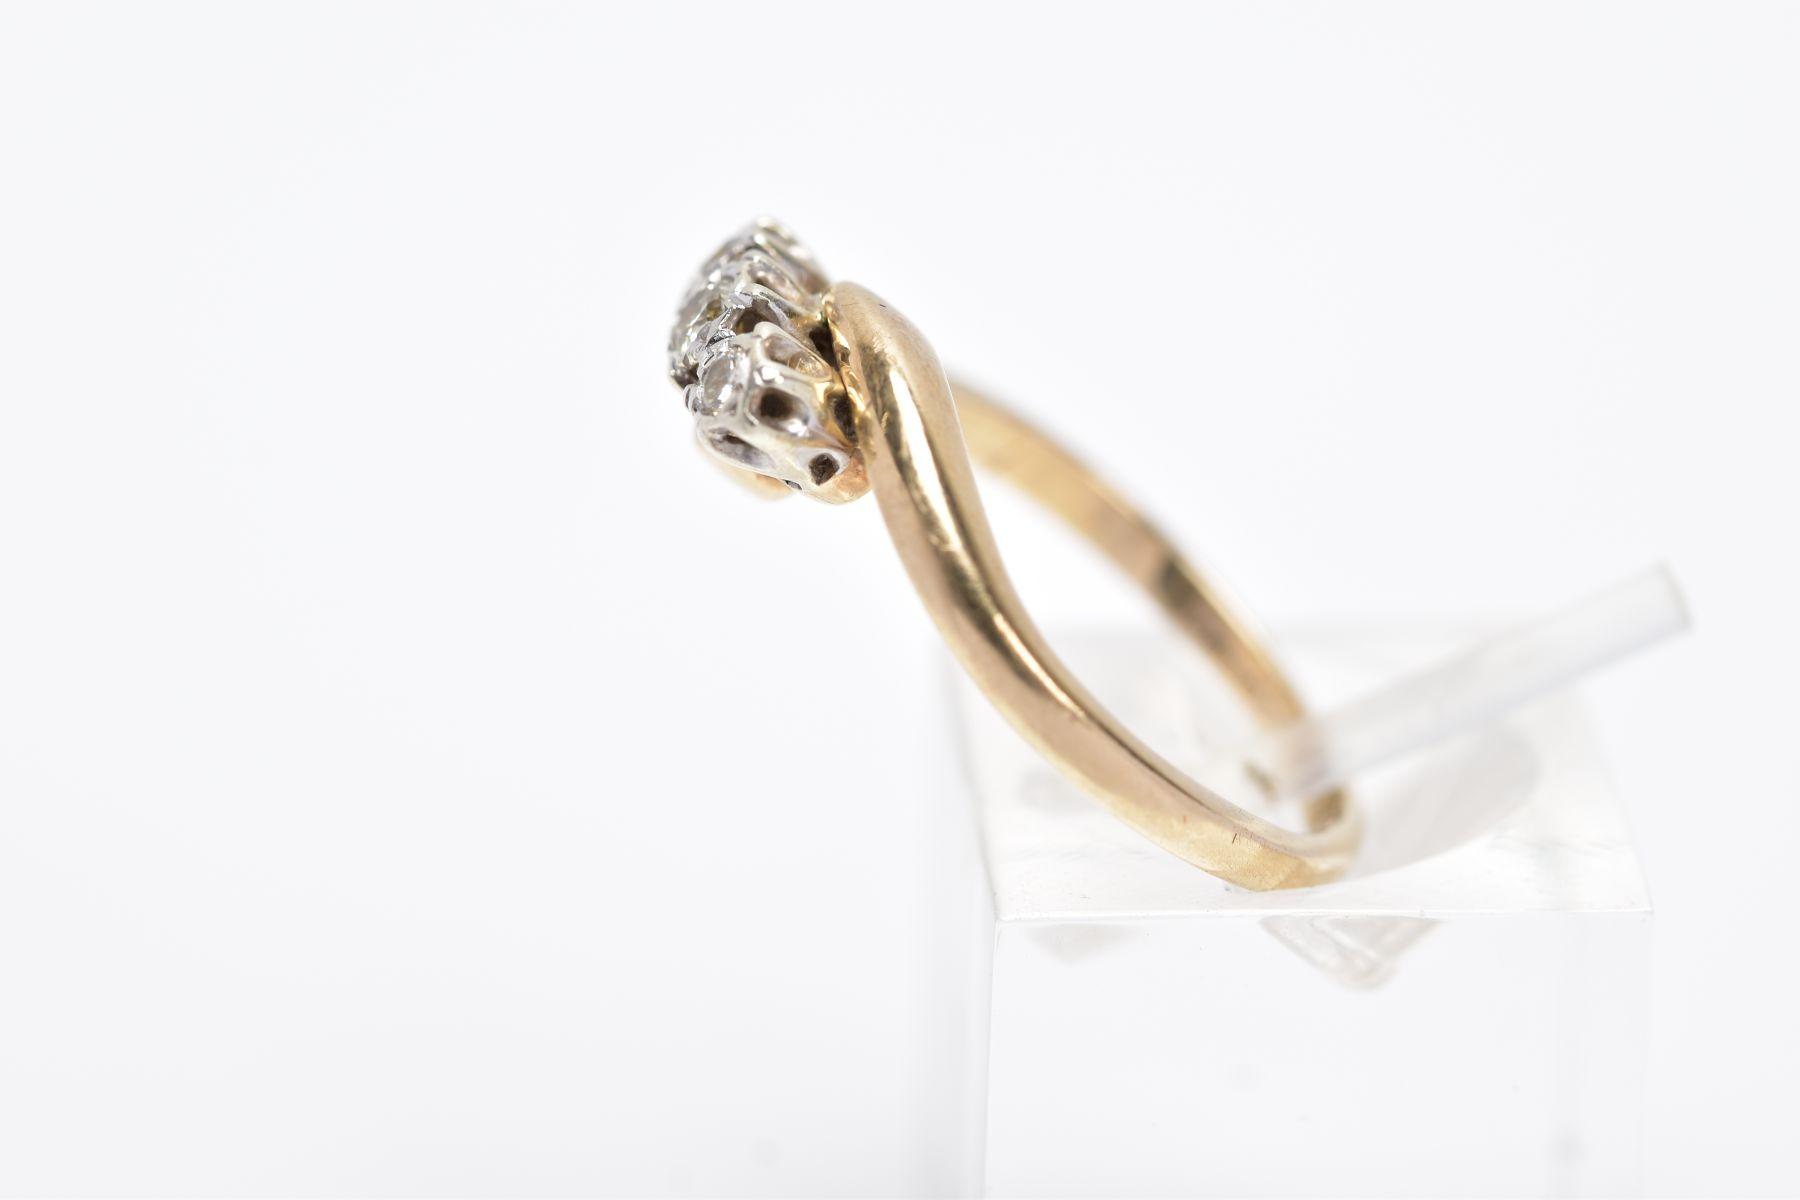 A 9CT GOLD THREE STONE DIAMOND RING, designed with three graduated round brilliant cut diamonds, - Image 2 of 4